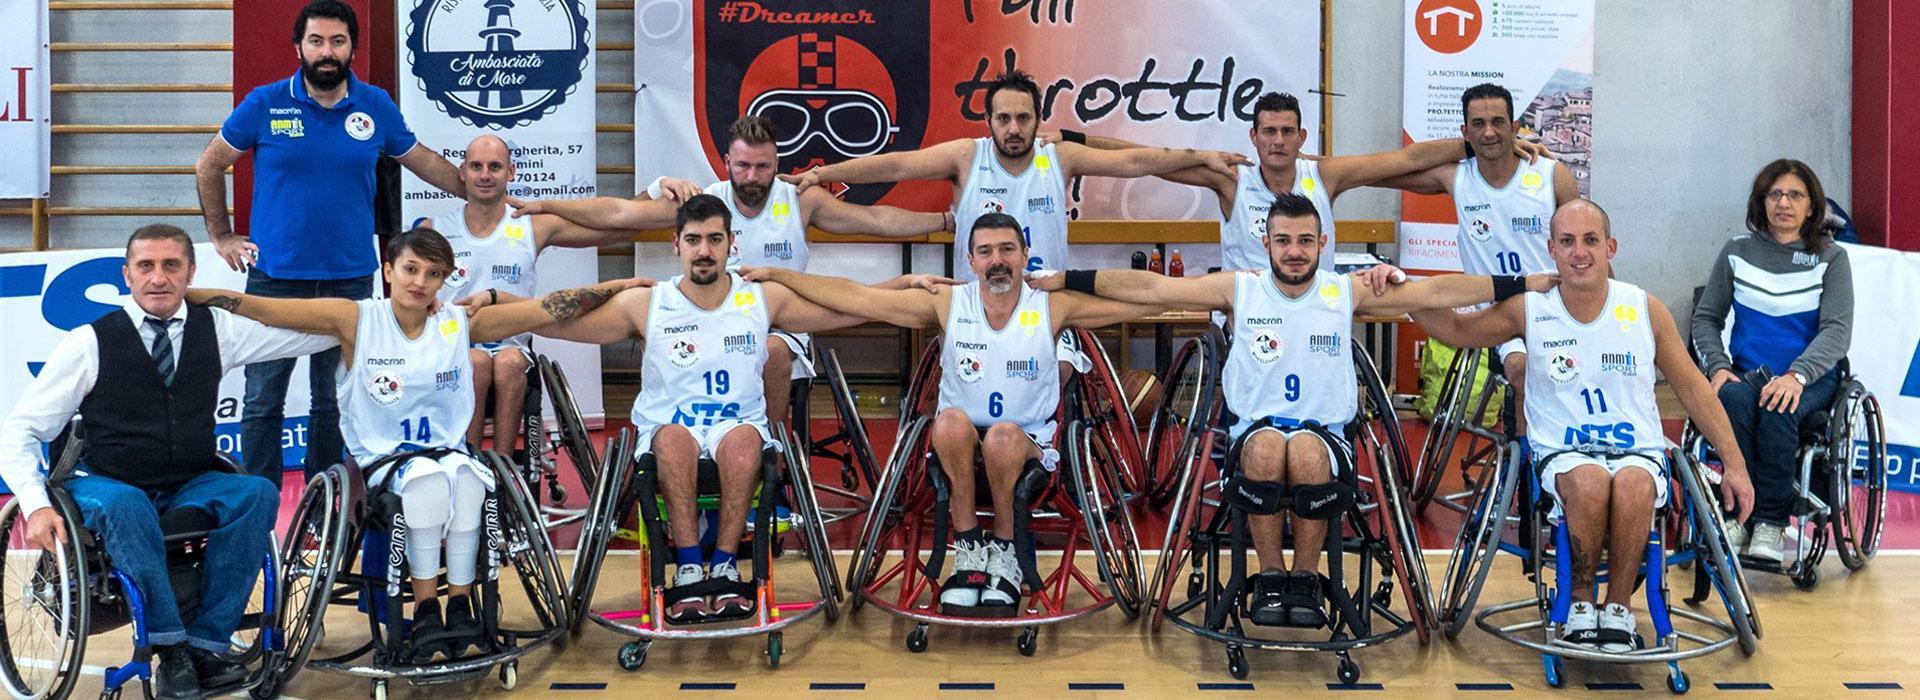 Basket in carrozzella a Rimini